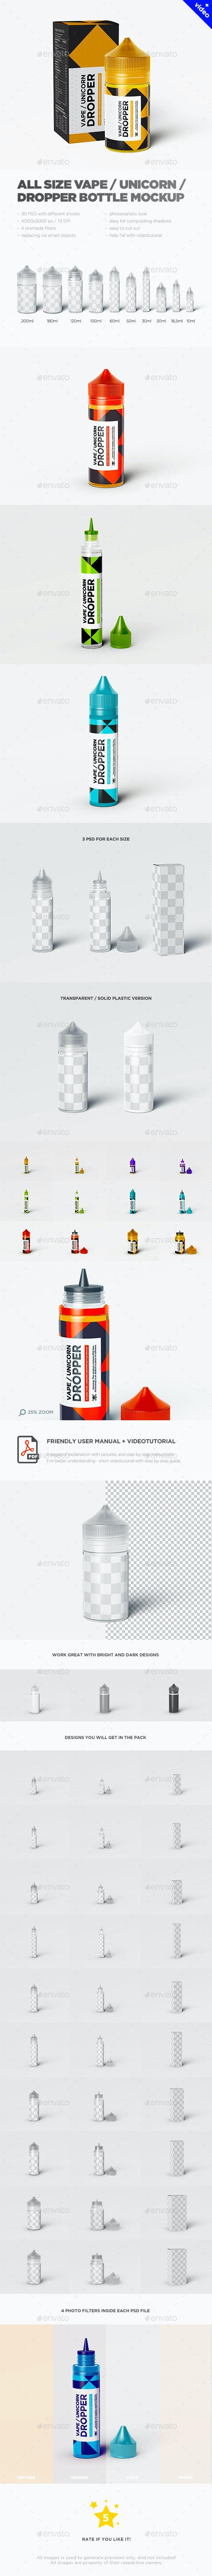 All Sizes Vape / Unicorn / Dropper Bottle MockUp